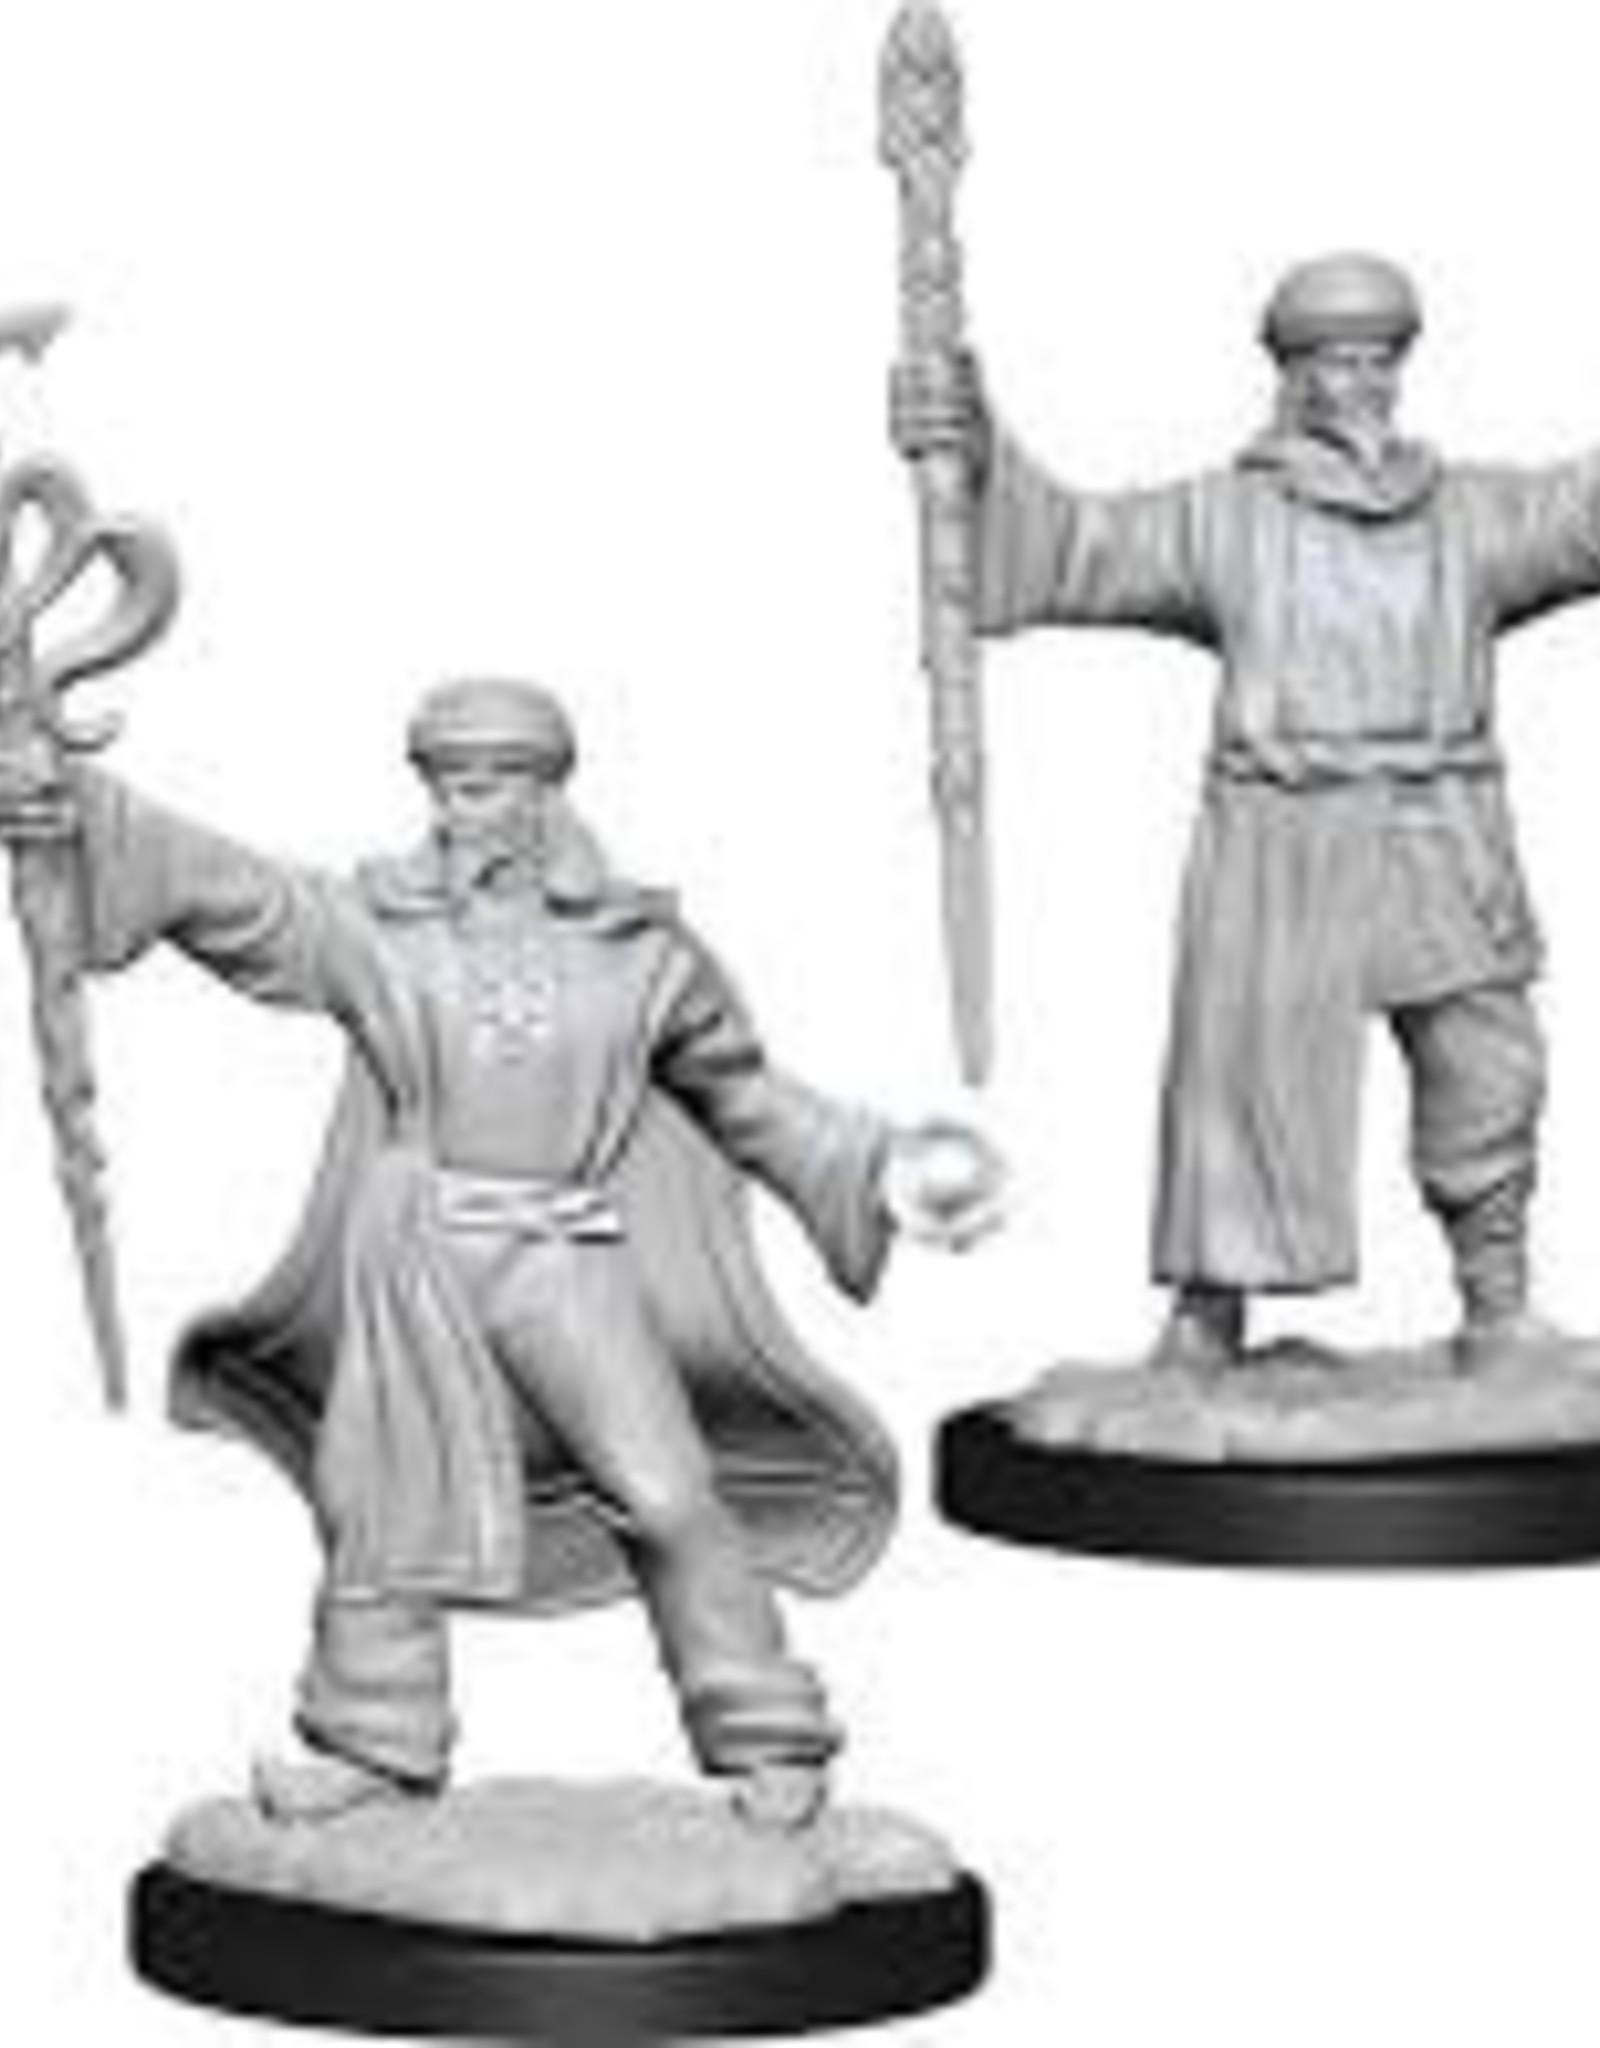 WizKids D&D Nolzur Human Wizard (He/Him/They/Them)